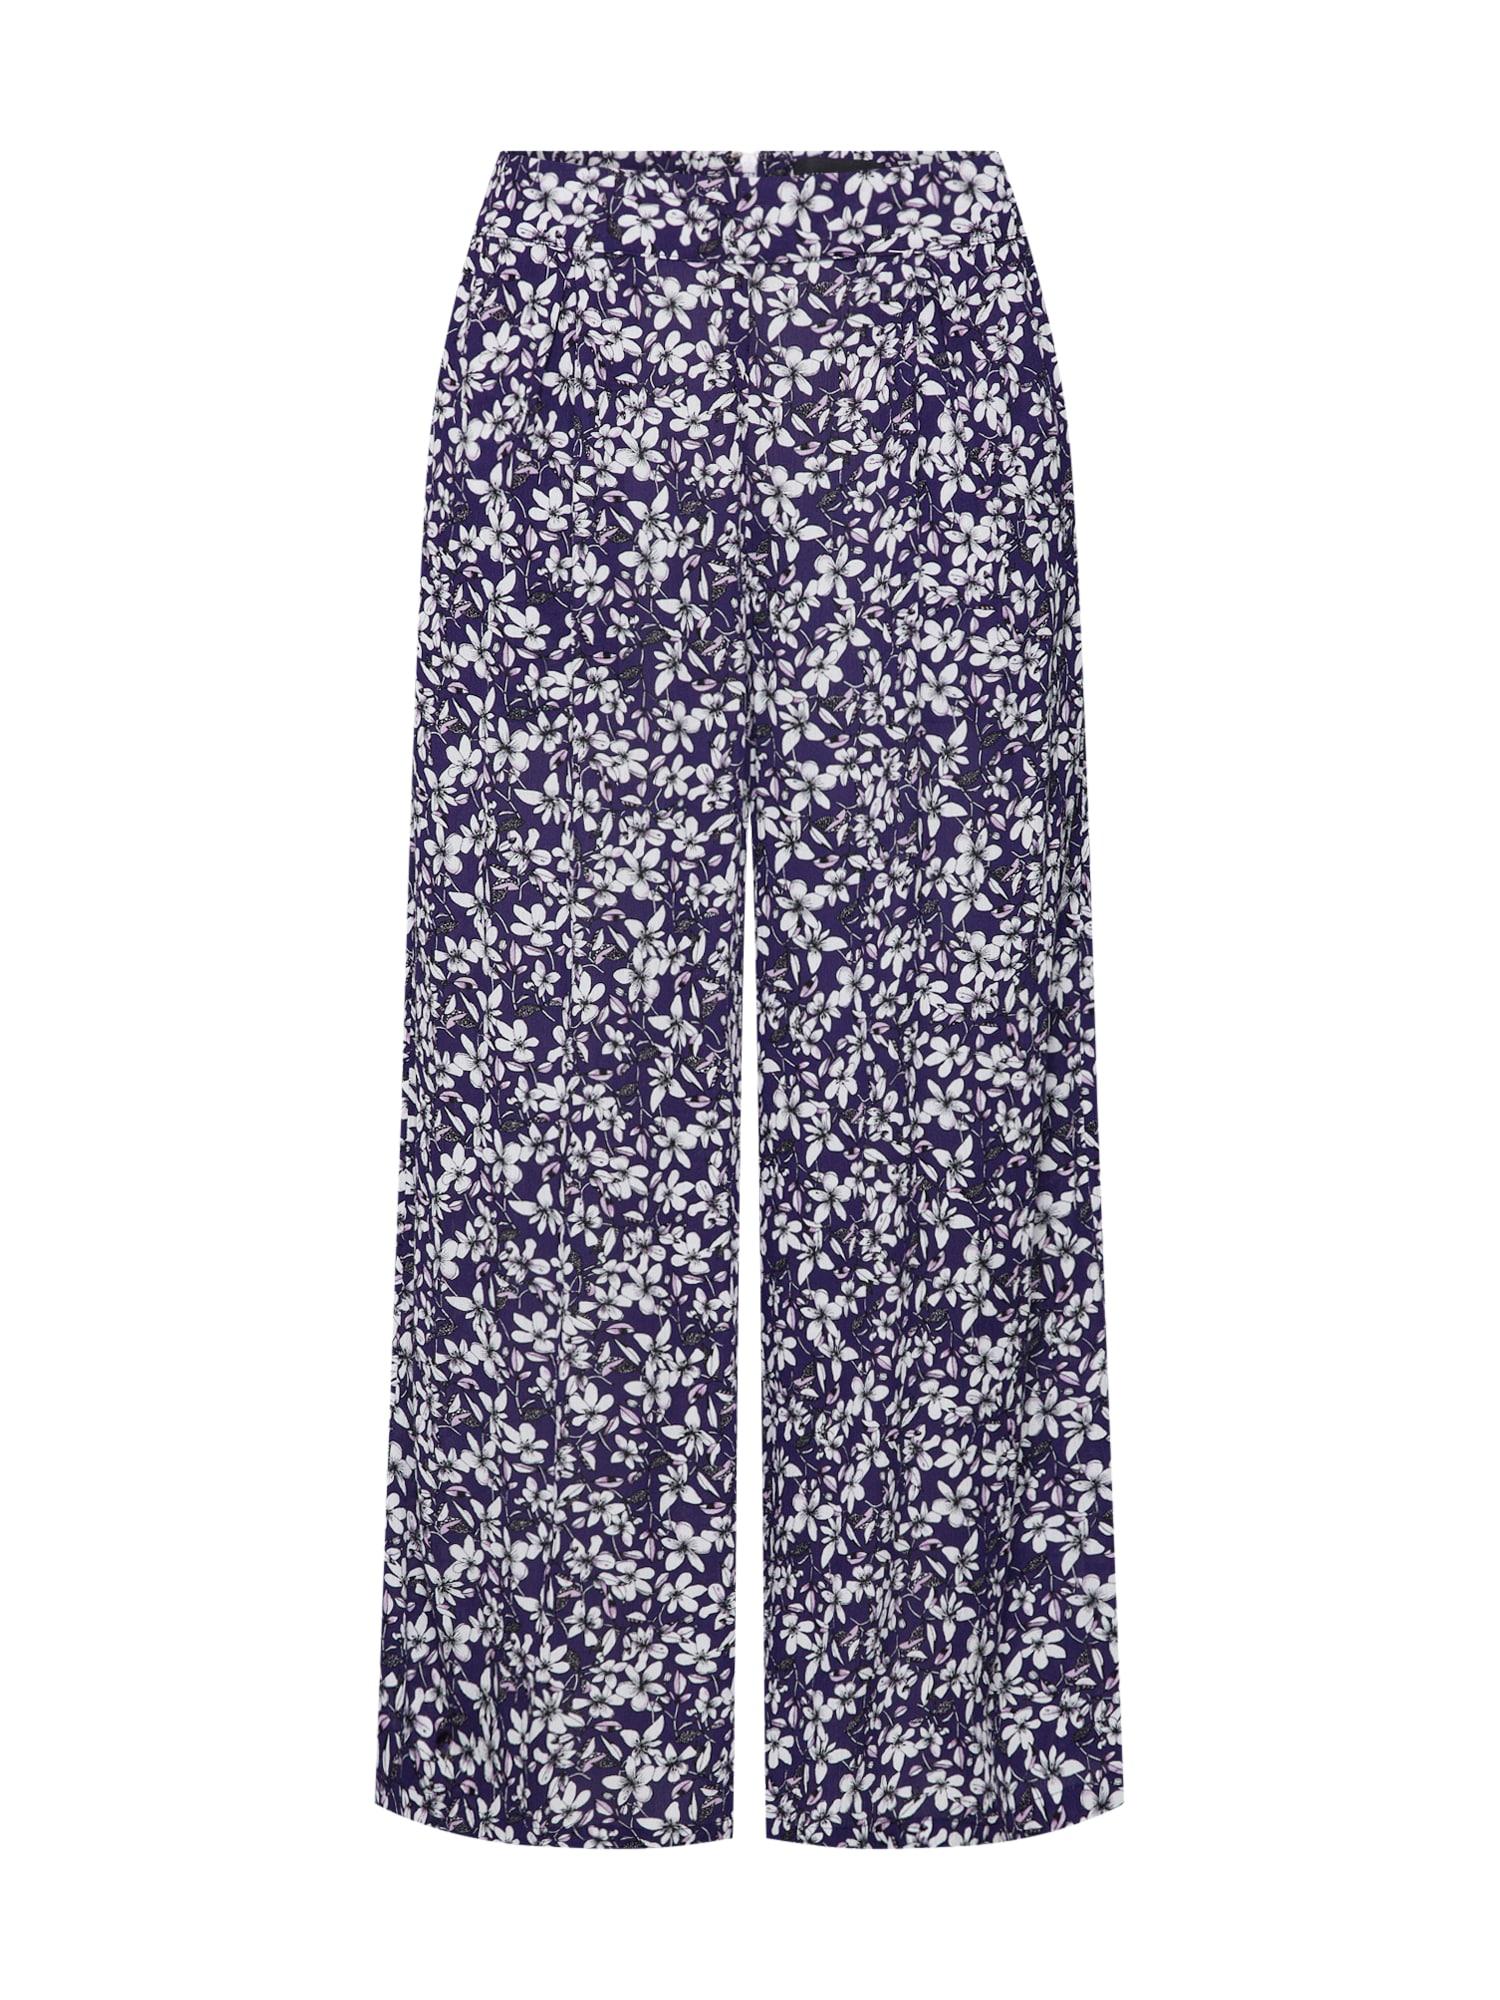 Kalhoty WILD JASMINE modrá bílá MINKPINK